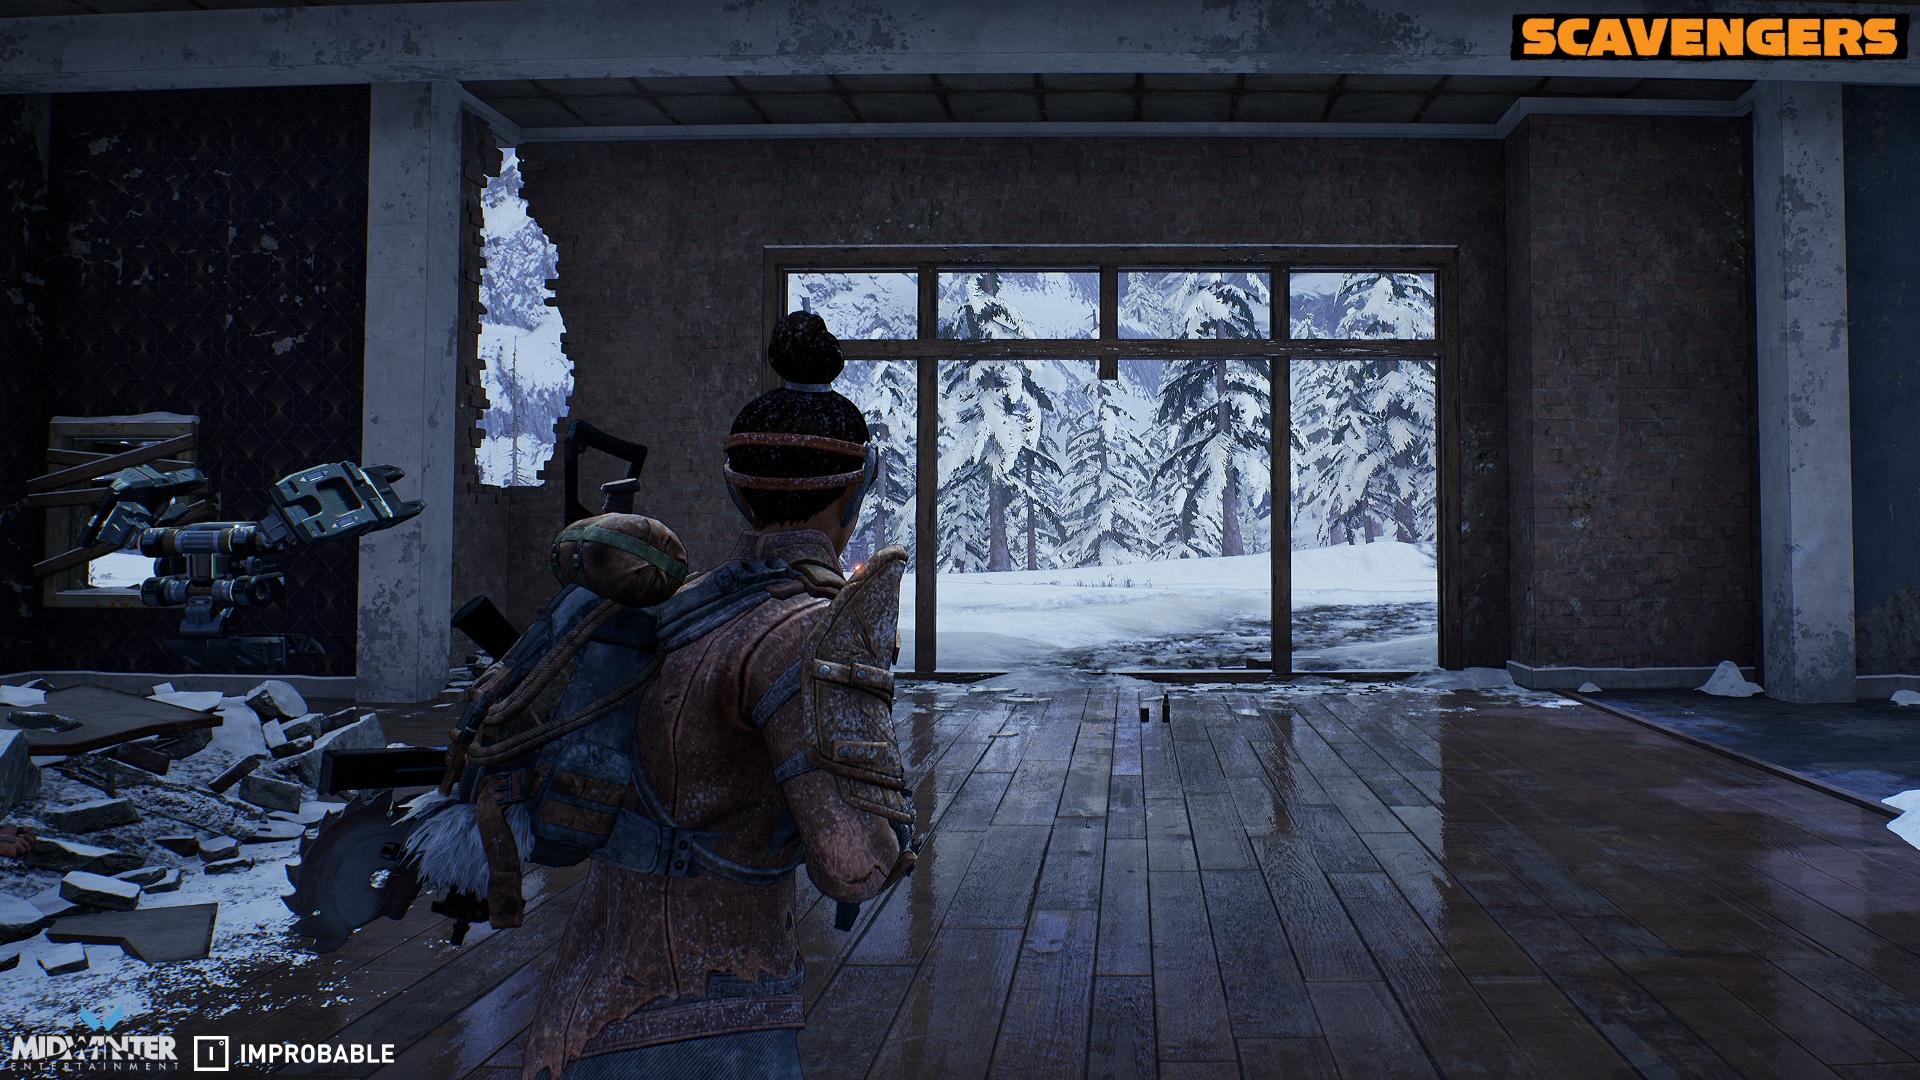 Scavengers E3 2019 screenshot 2